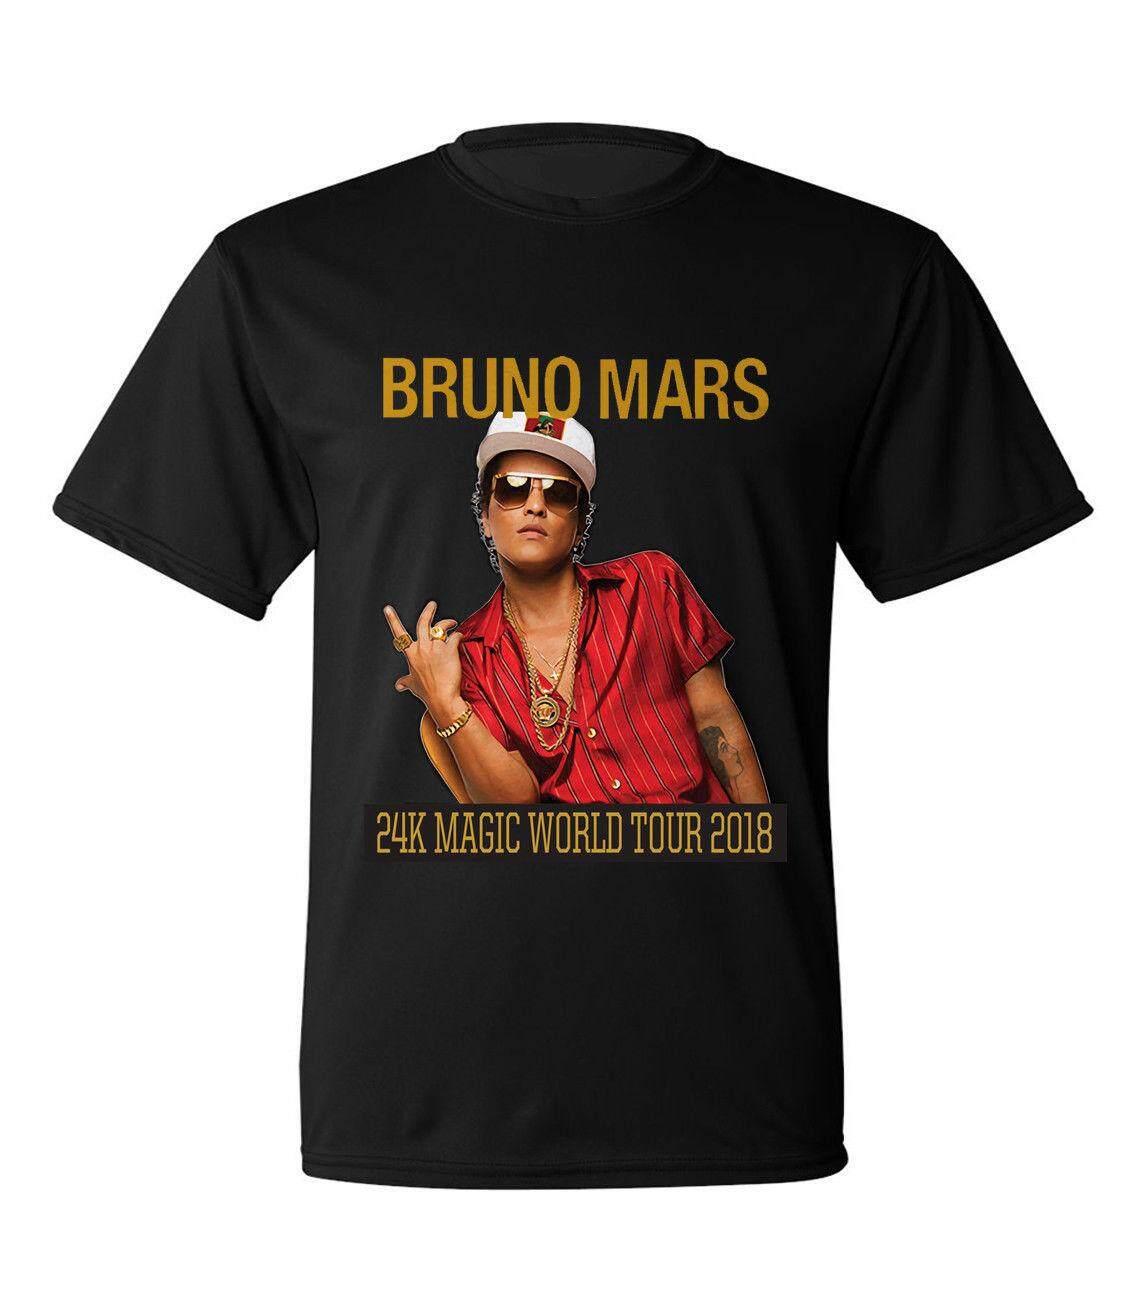 Fitur Baby Boy Bruno Mars Kaos Distro Original Kualitas Terbaik Cotton Man Tee O Neck T Shirts Men Short Sleeve Tshirt